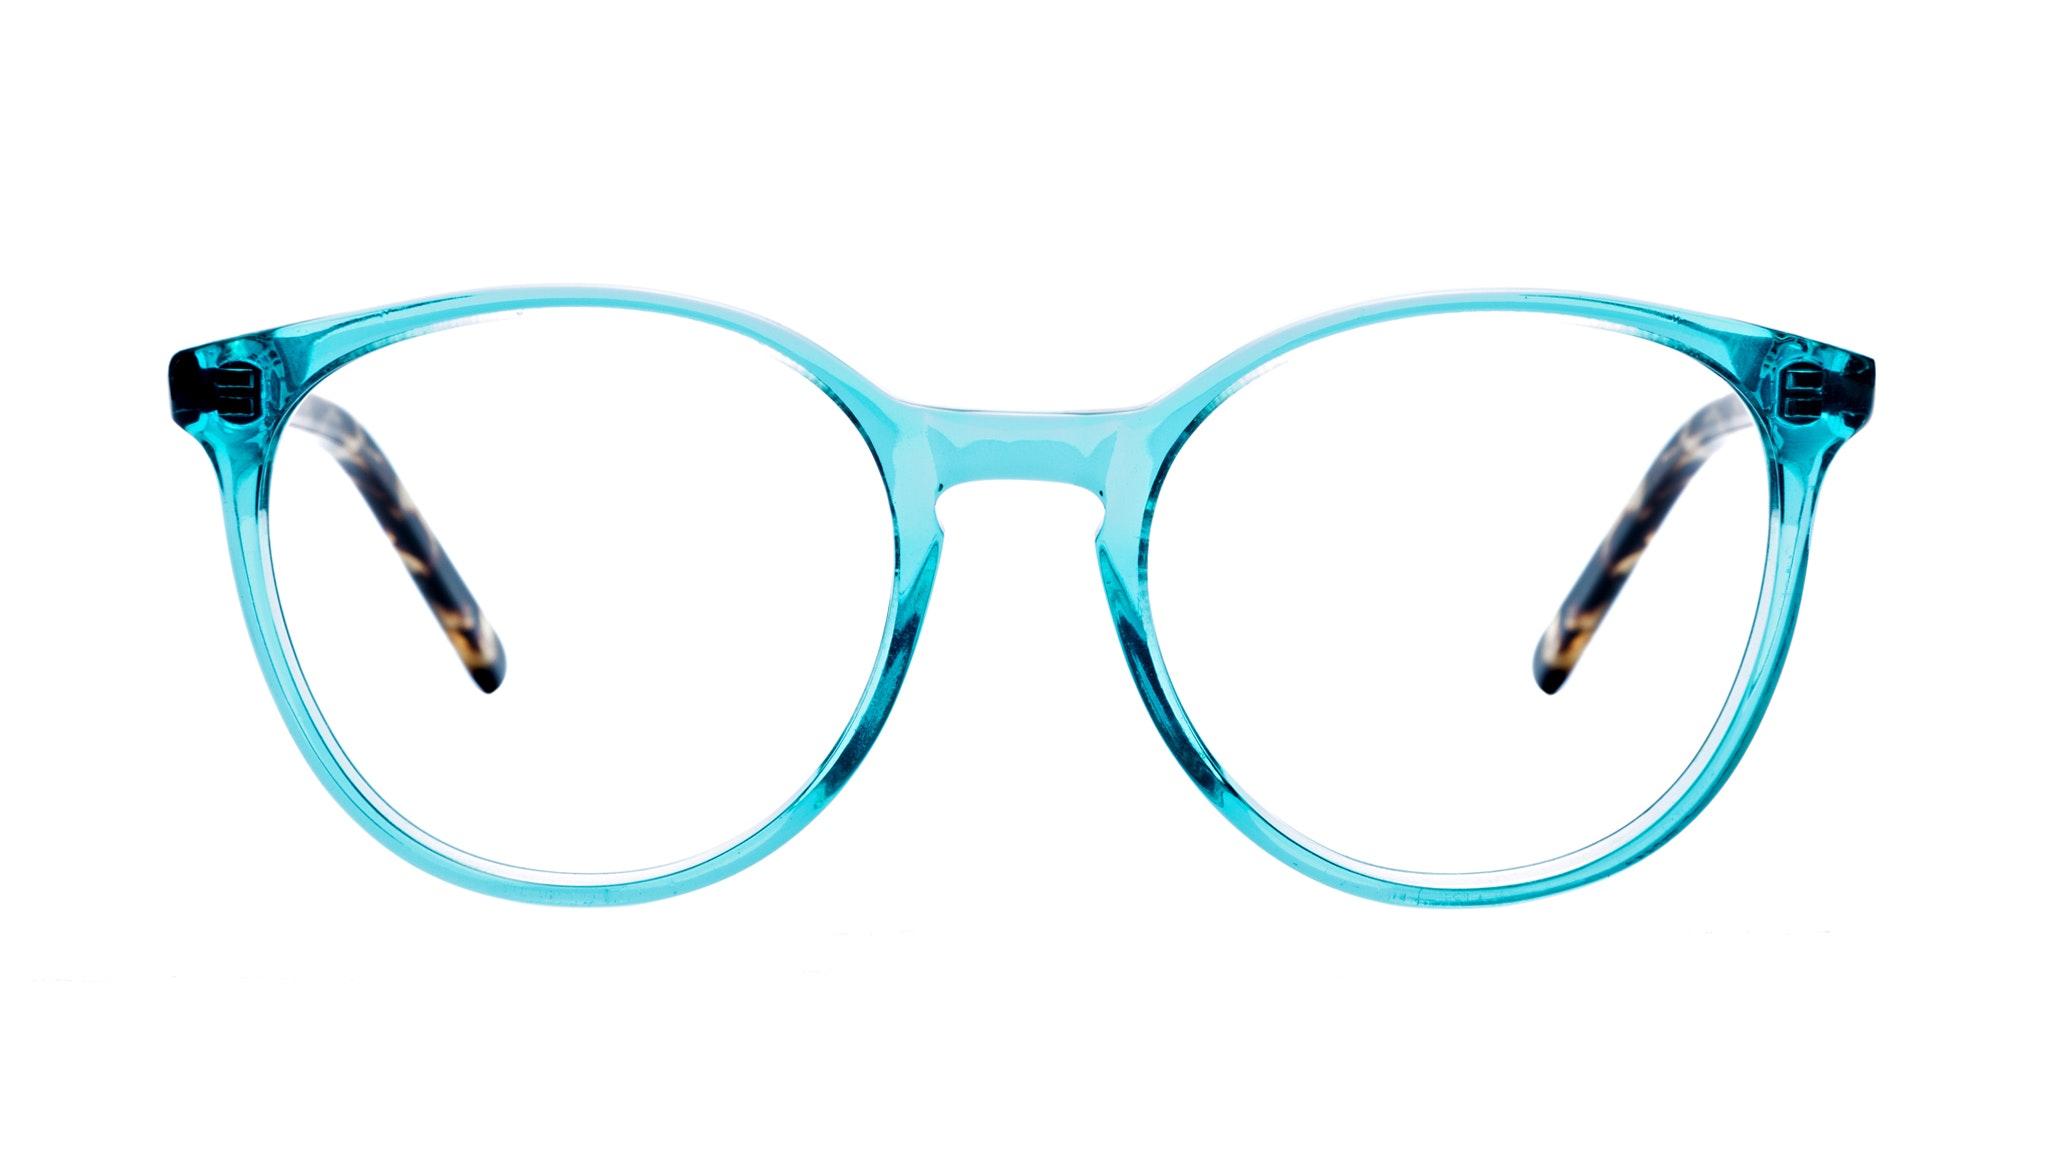 Affordable Fashion Glasses Round Eyeglasses Women Embrace Teal Tort